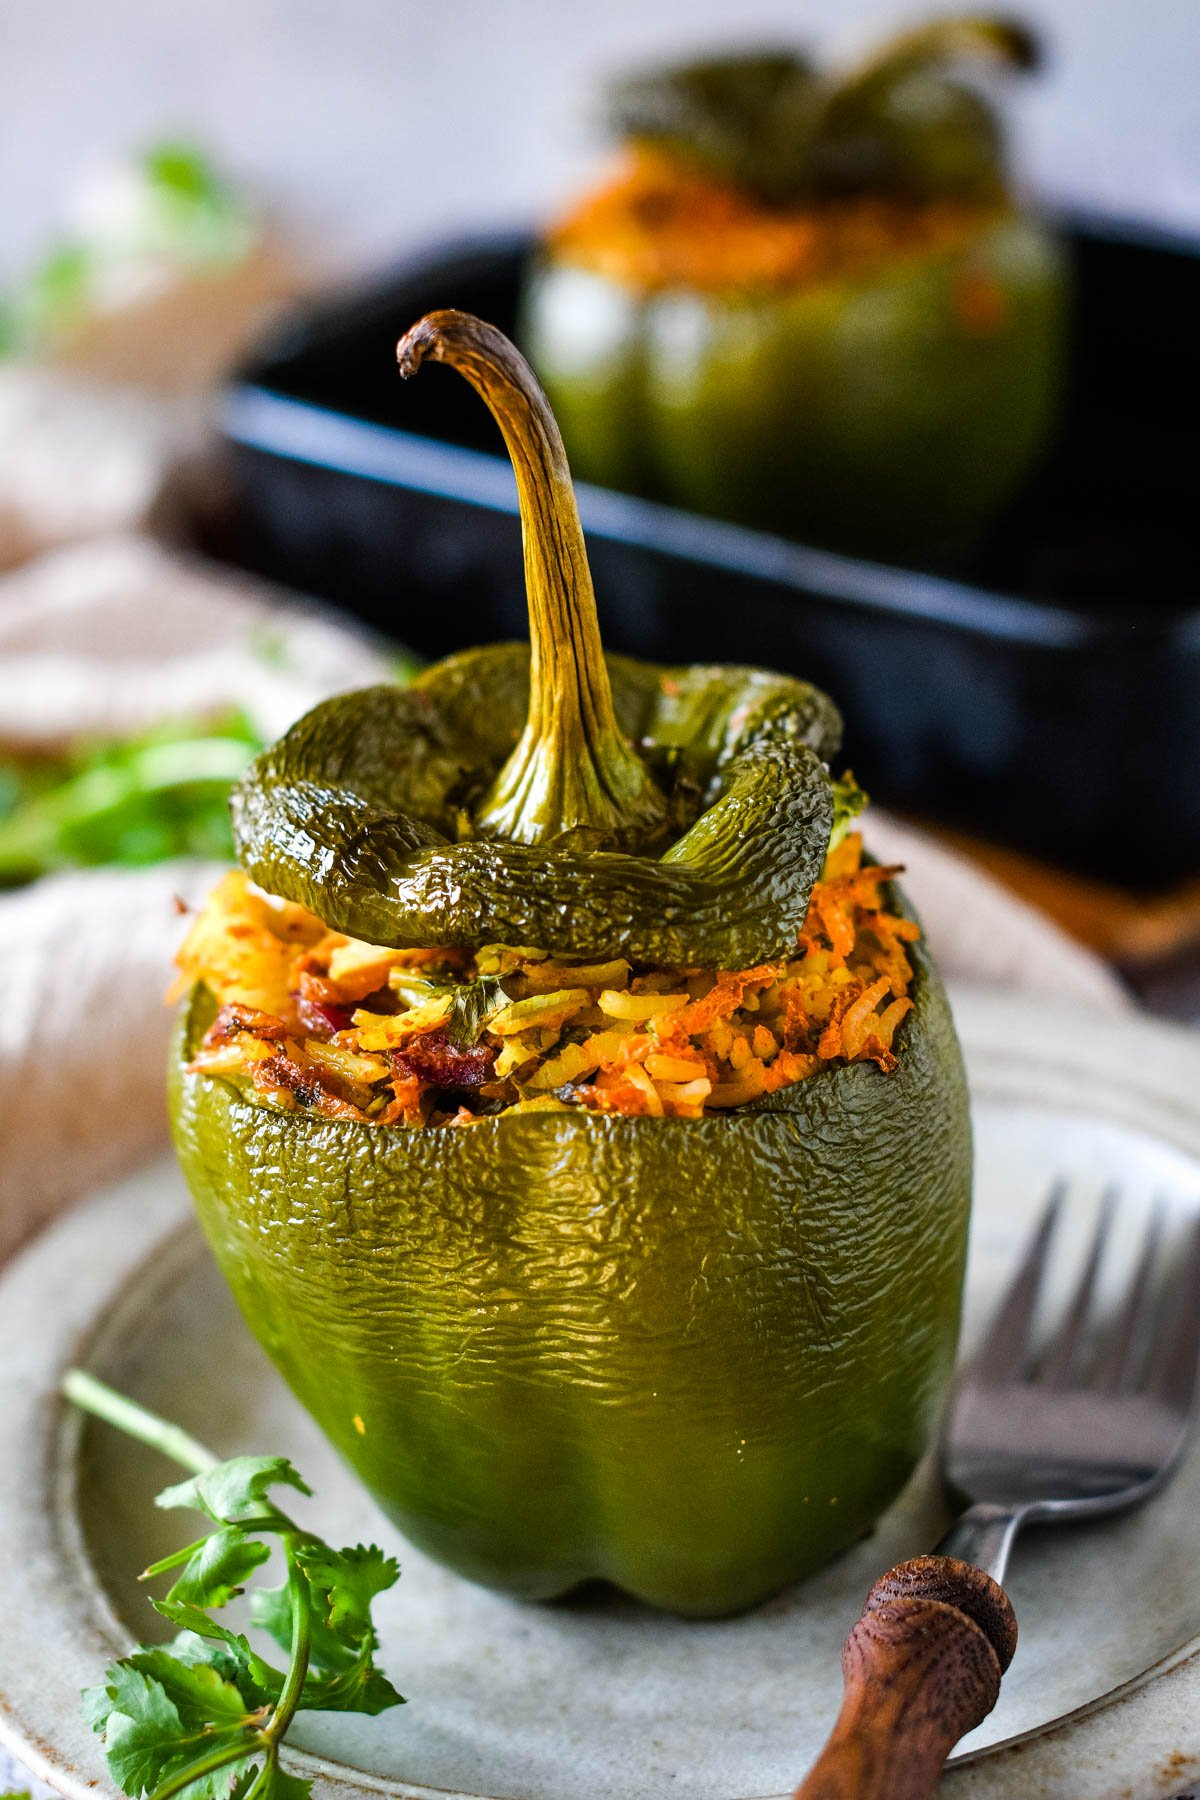 vegetarian curry stuffed pepper on plate